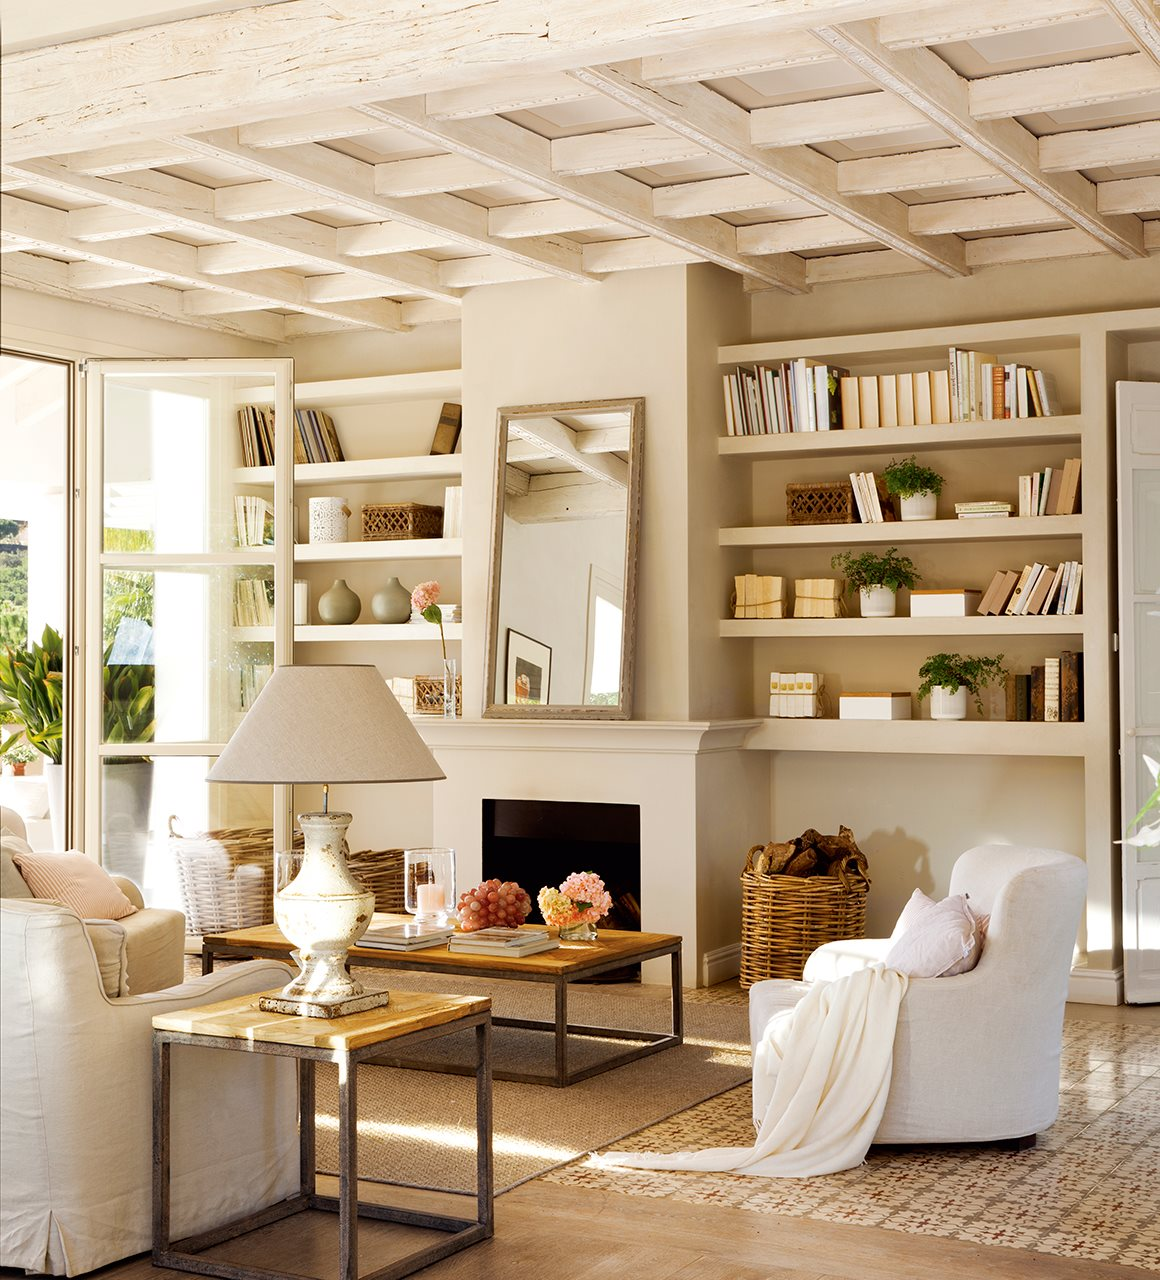 El mueble chimeneas fabulous la imagen se est cargando - El mueble chimeneas ...